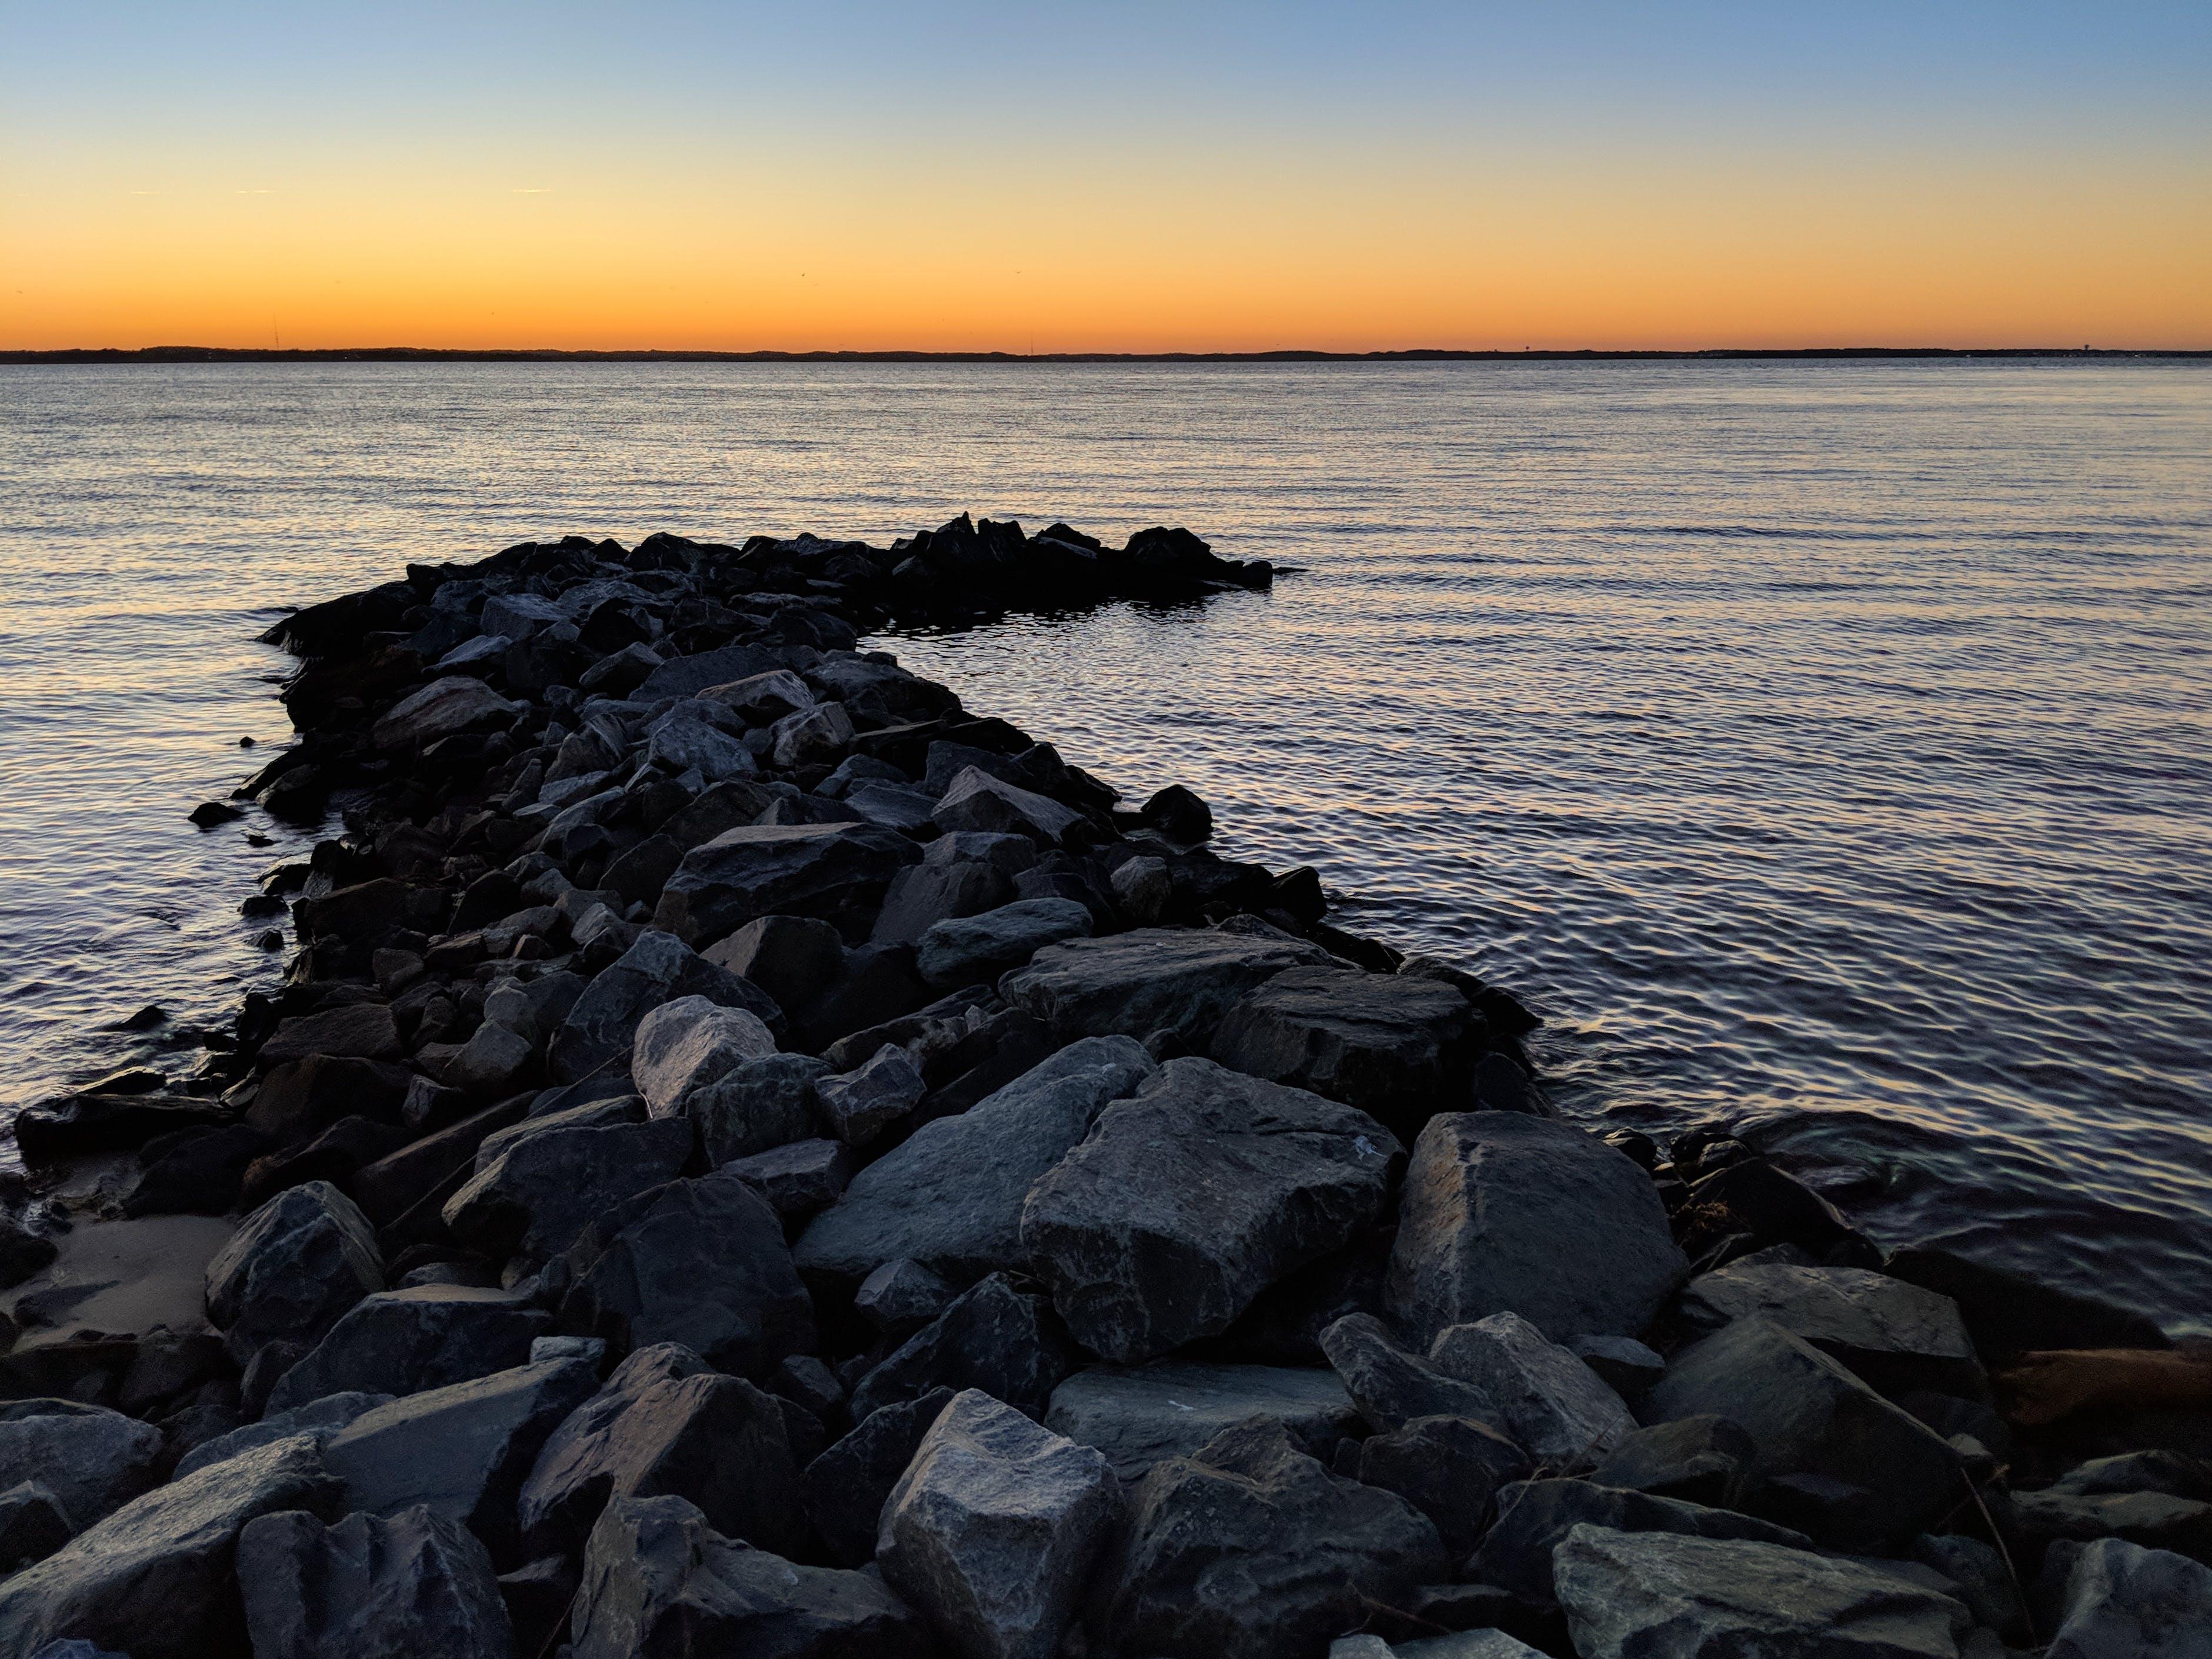 Free stock photo of bay, golden sunset, jetty, rocks